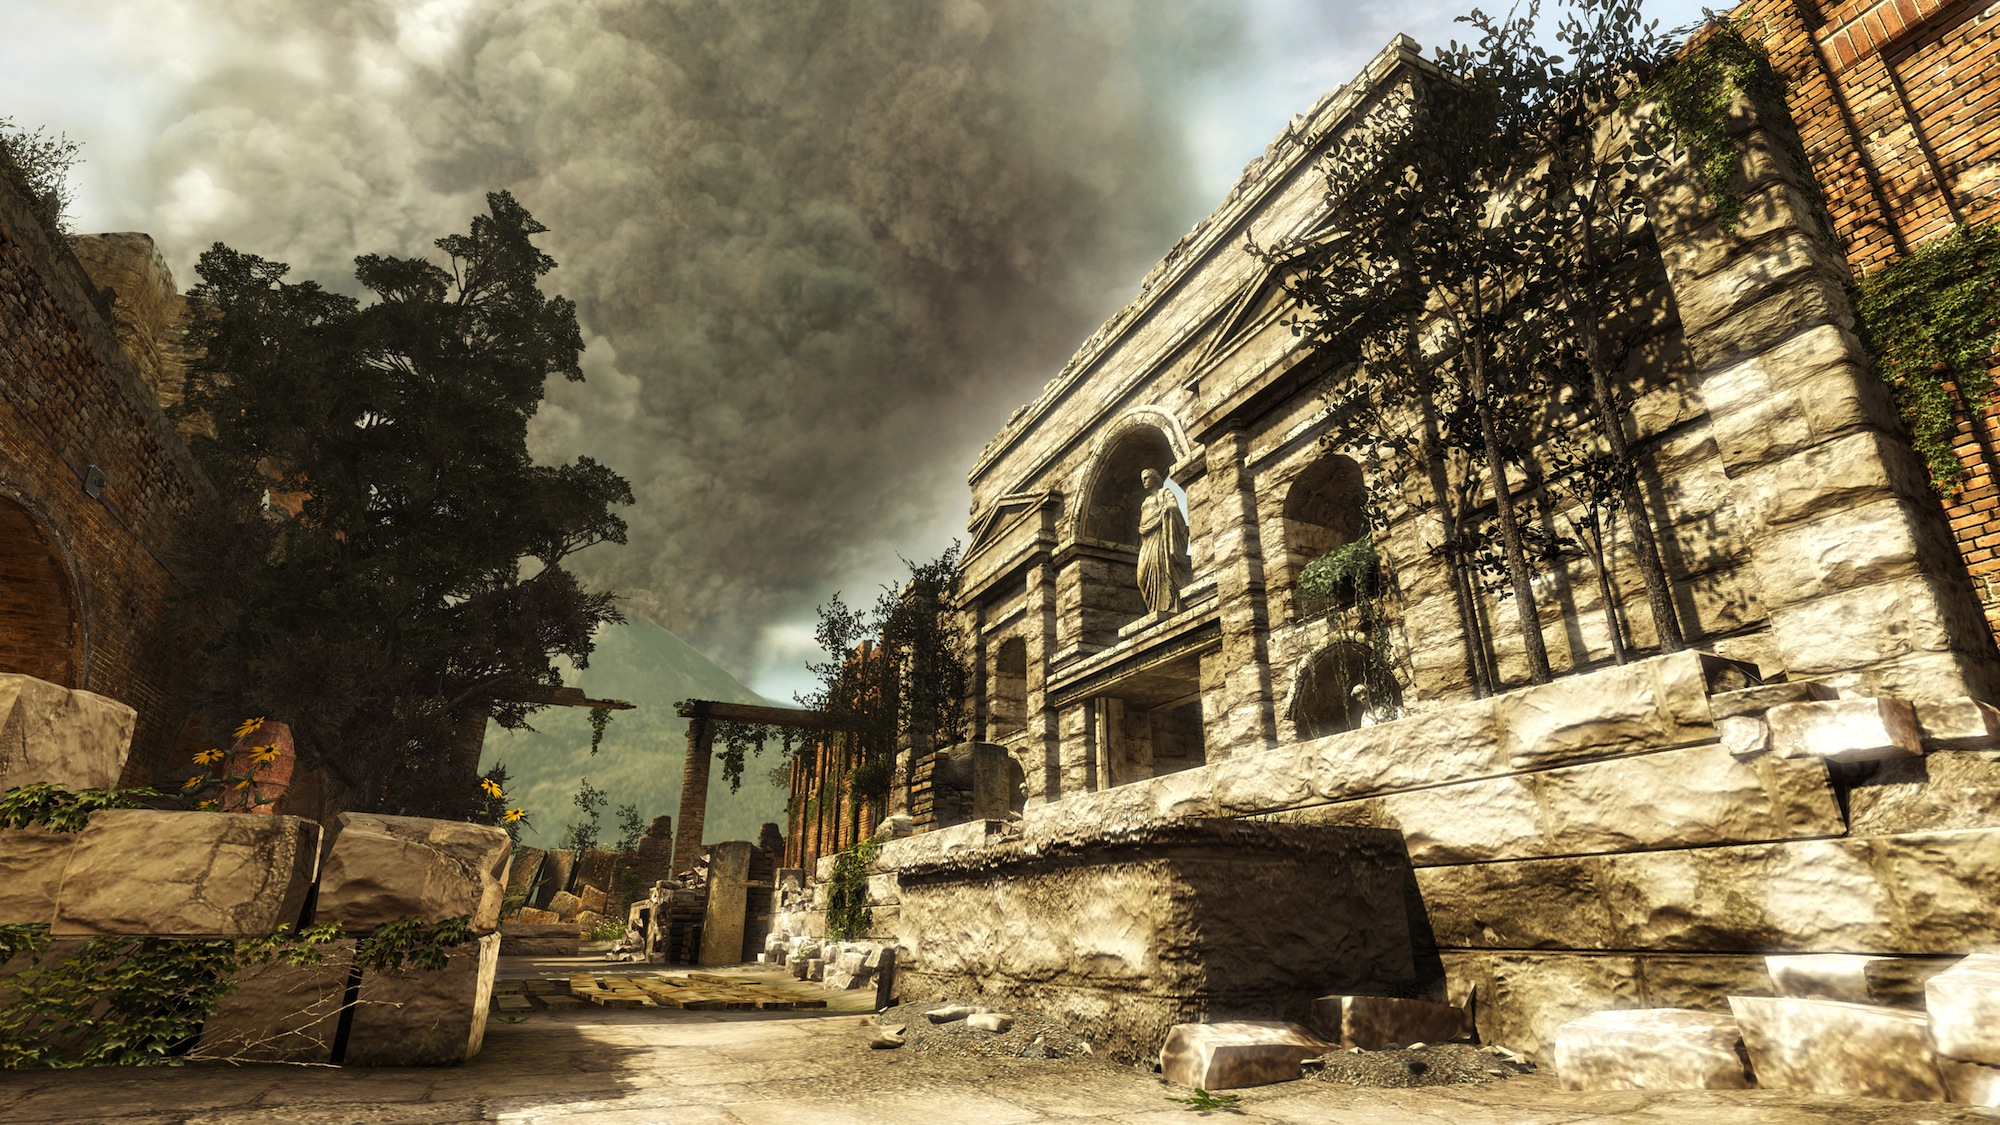 Erosion | Call of Duty Wiki | FANDOM powered by Wikia